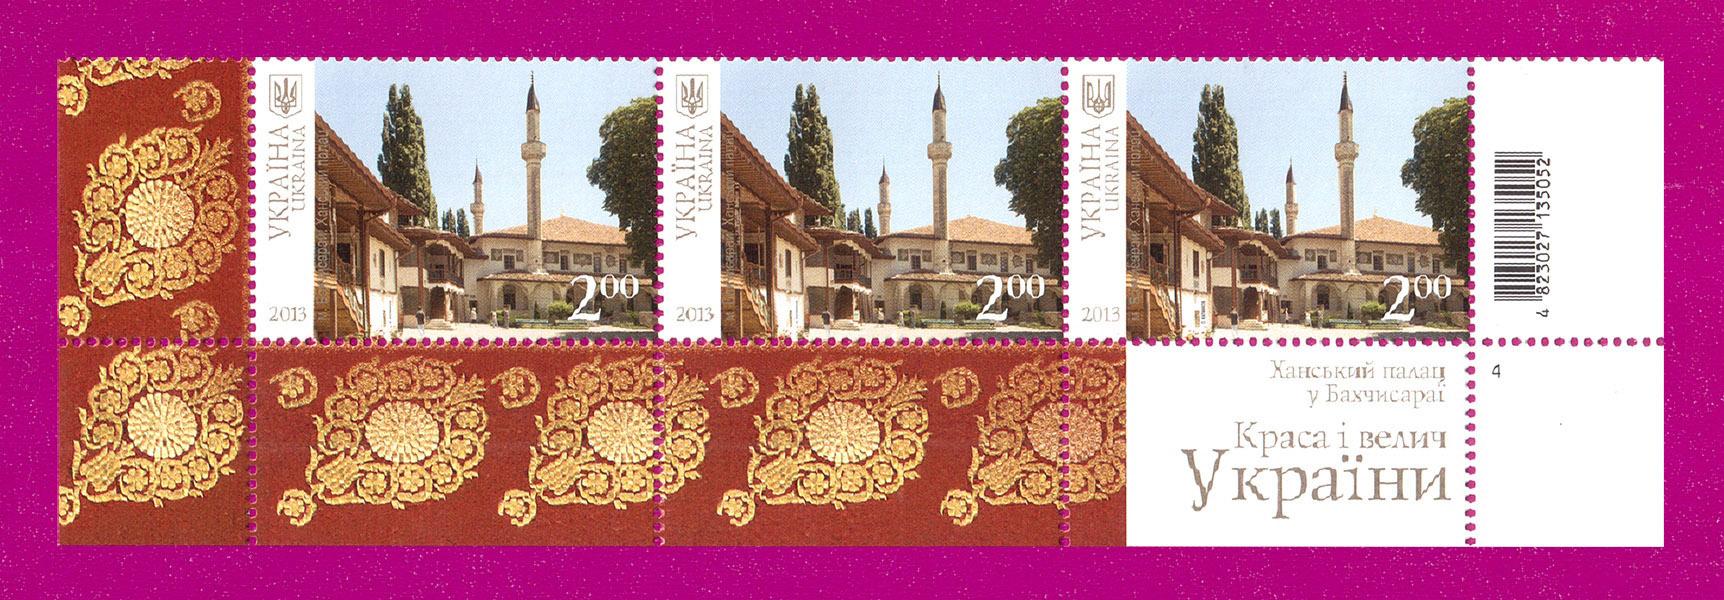 Ukraine stamps Part of the sheetlet Crimea. Bakhchisarai. Khan's palace DOWN